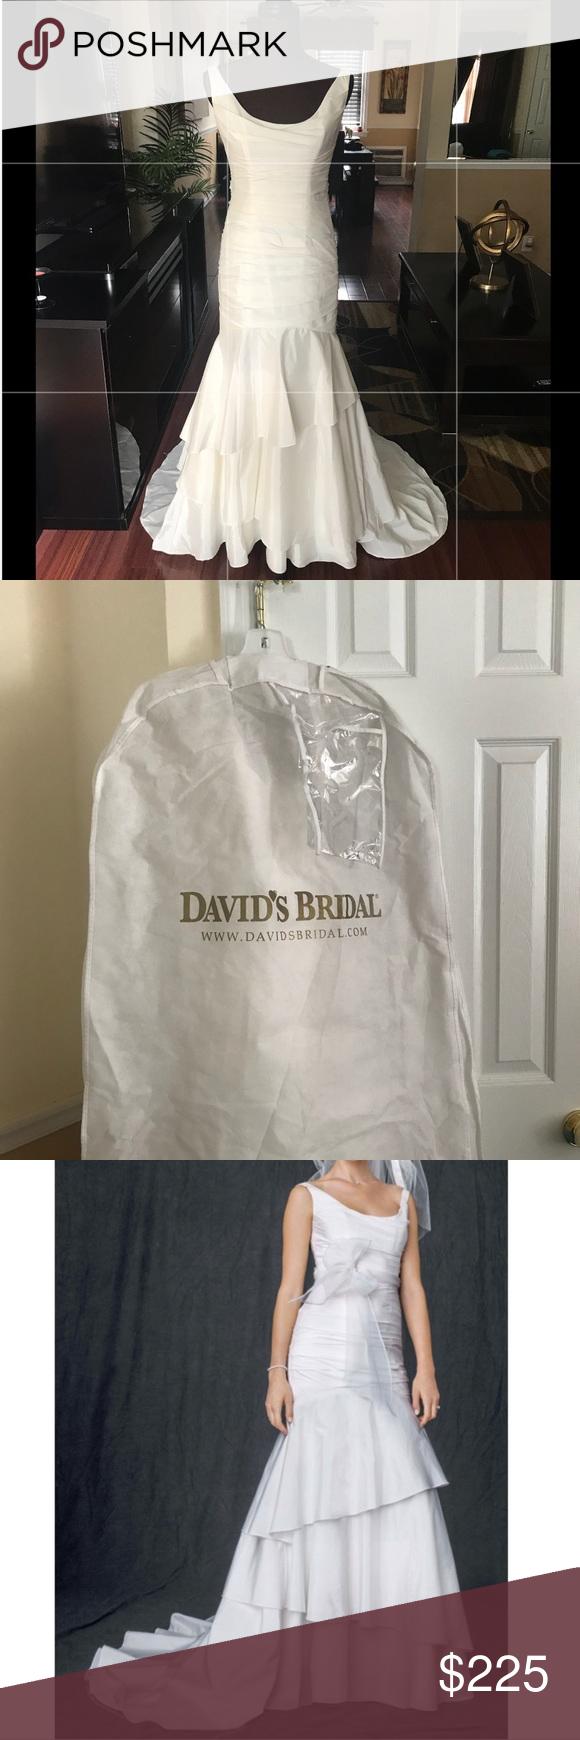 David's Bridal Scoop Neck Tiered Wedding Dress Tiered